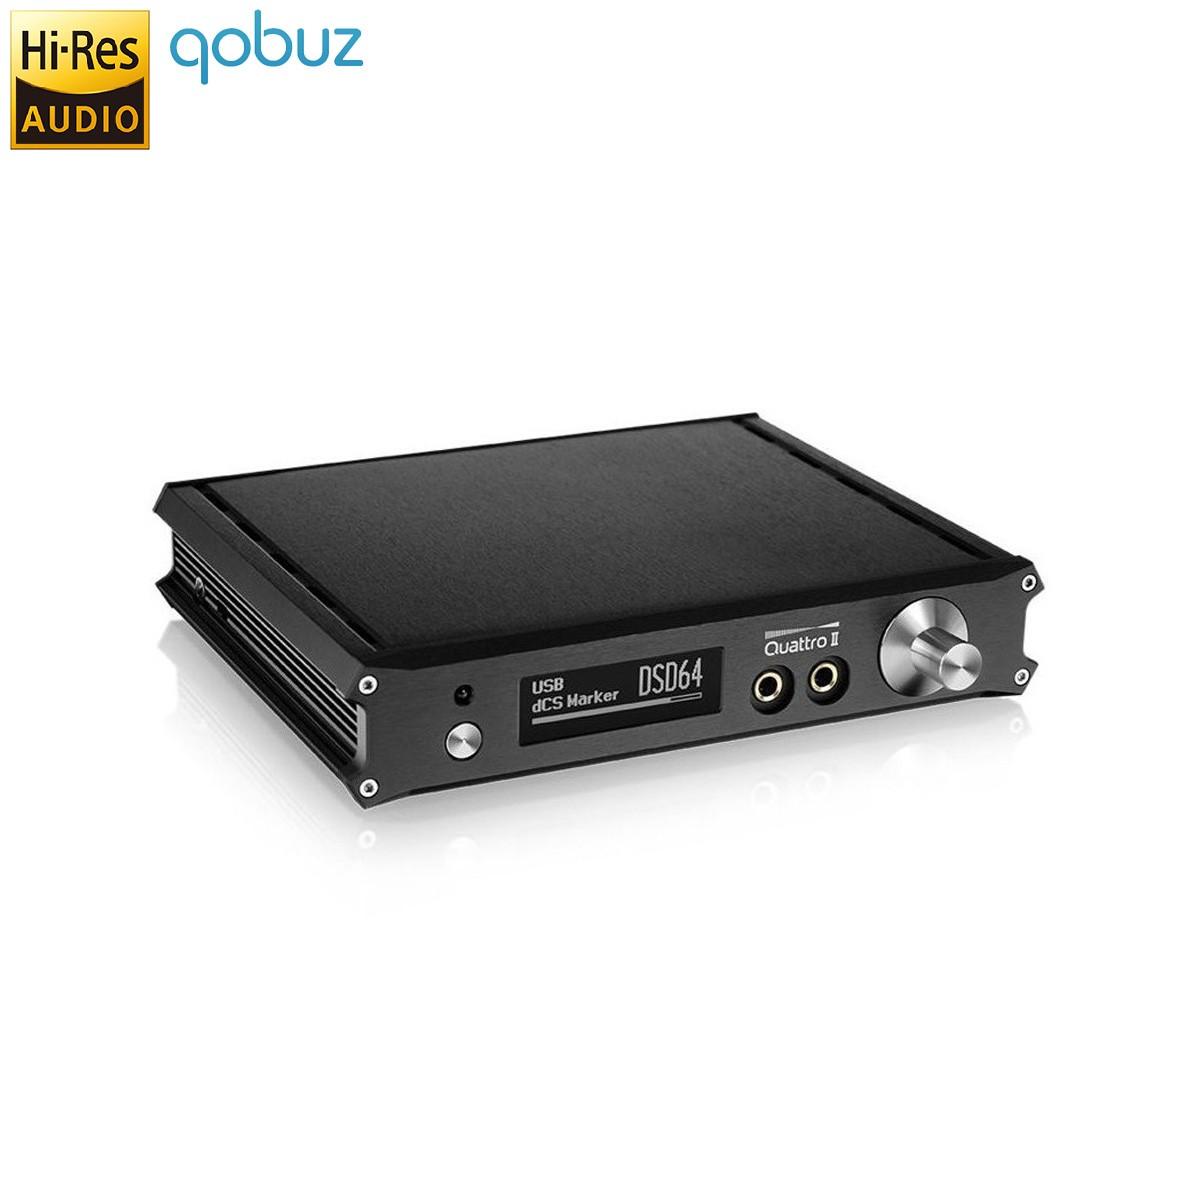 MATRIX QUATTRO II ADVANCED DAC ES9018S 32bit/384kHz DSD / Headphone Amp